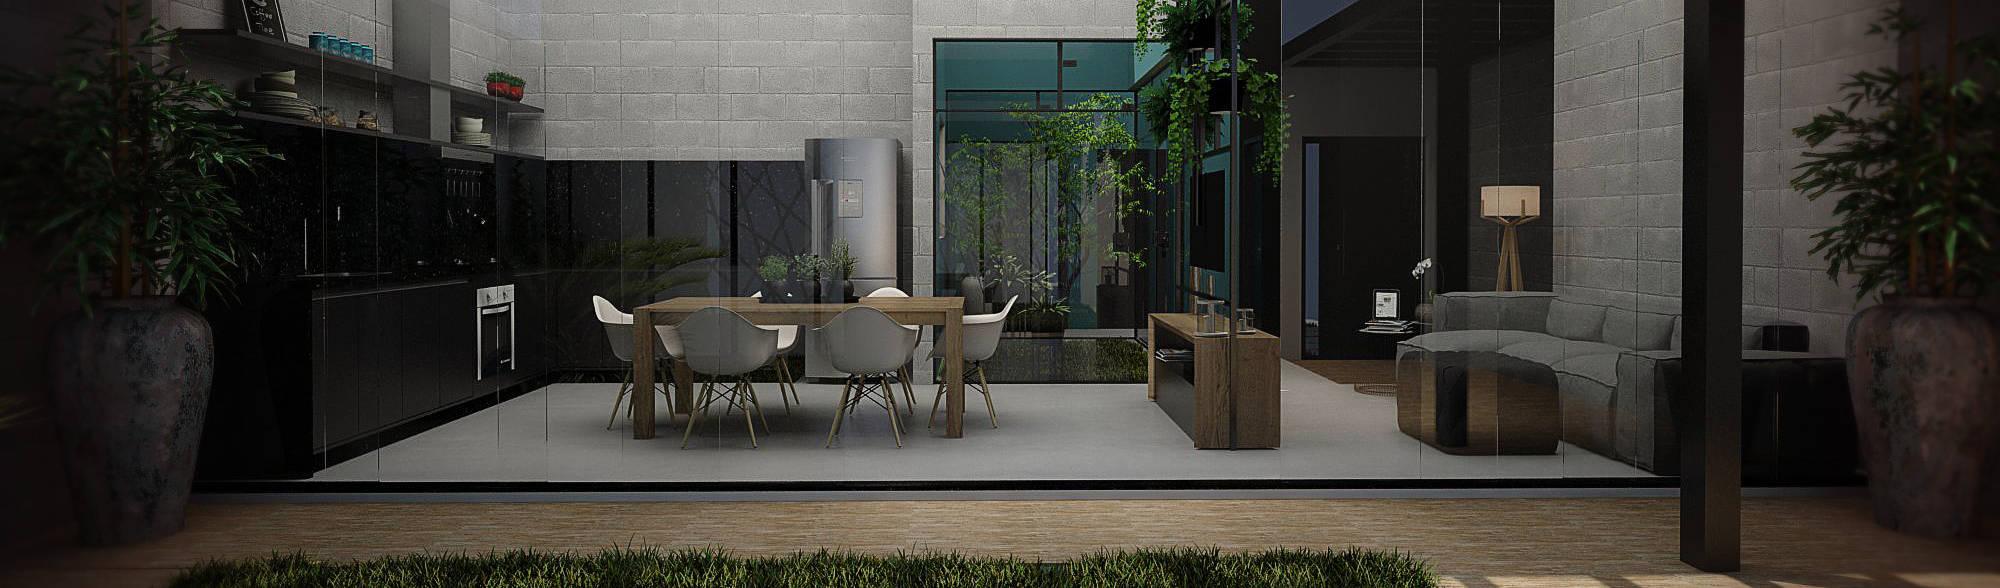 THACO. Arquitetura e Ambientes